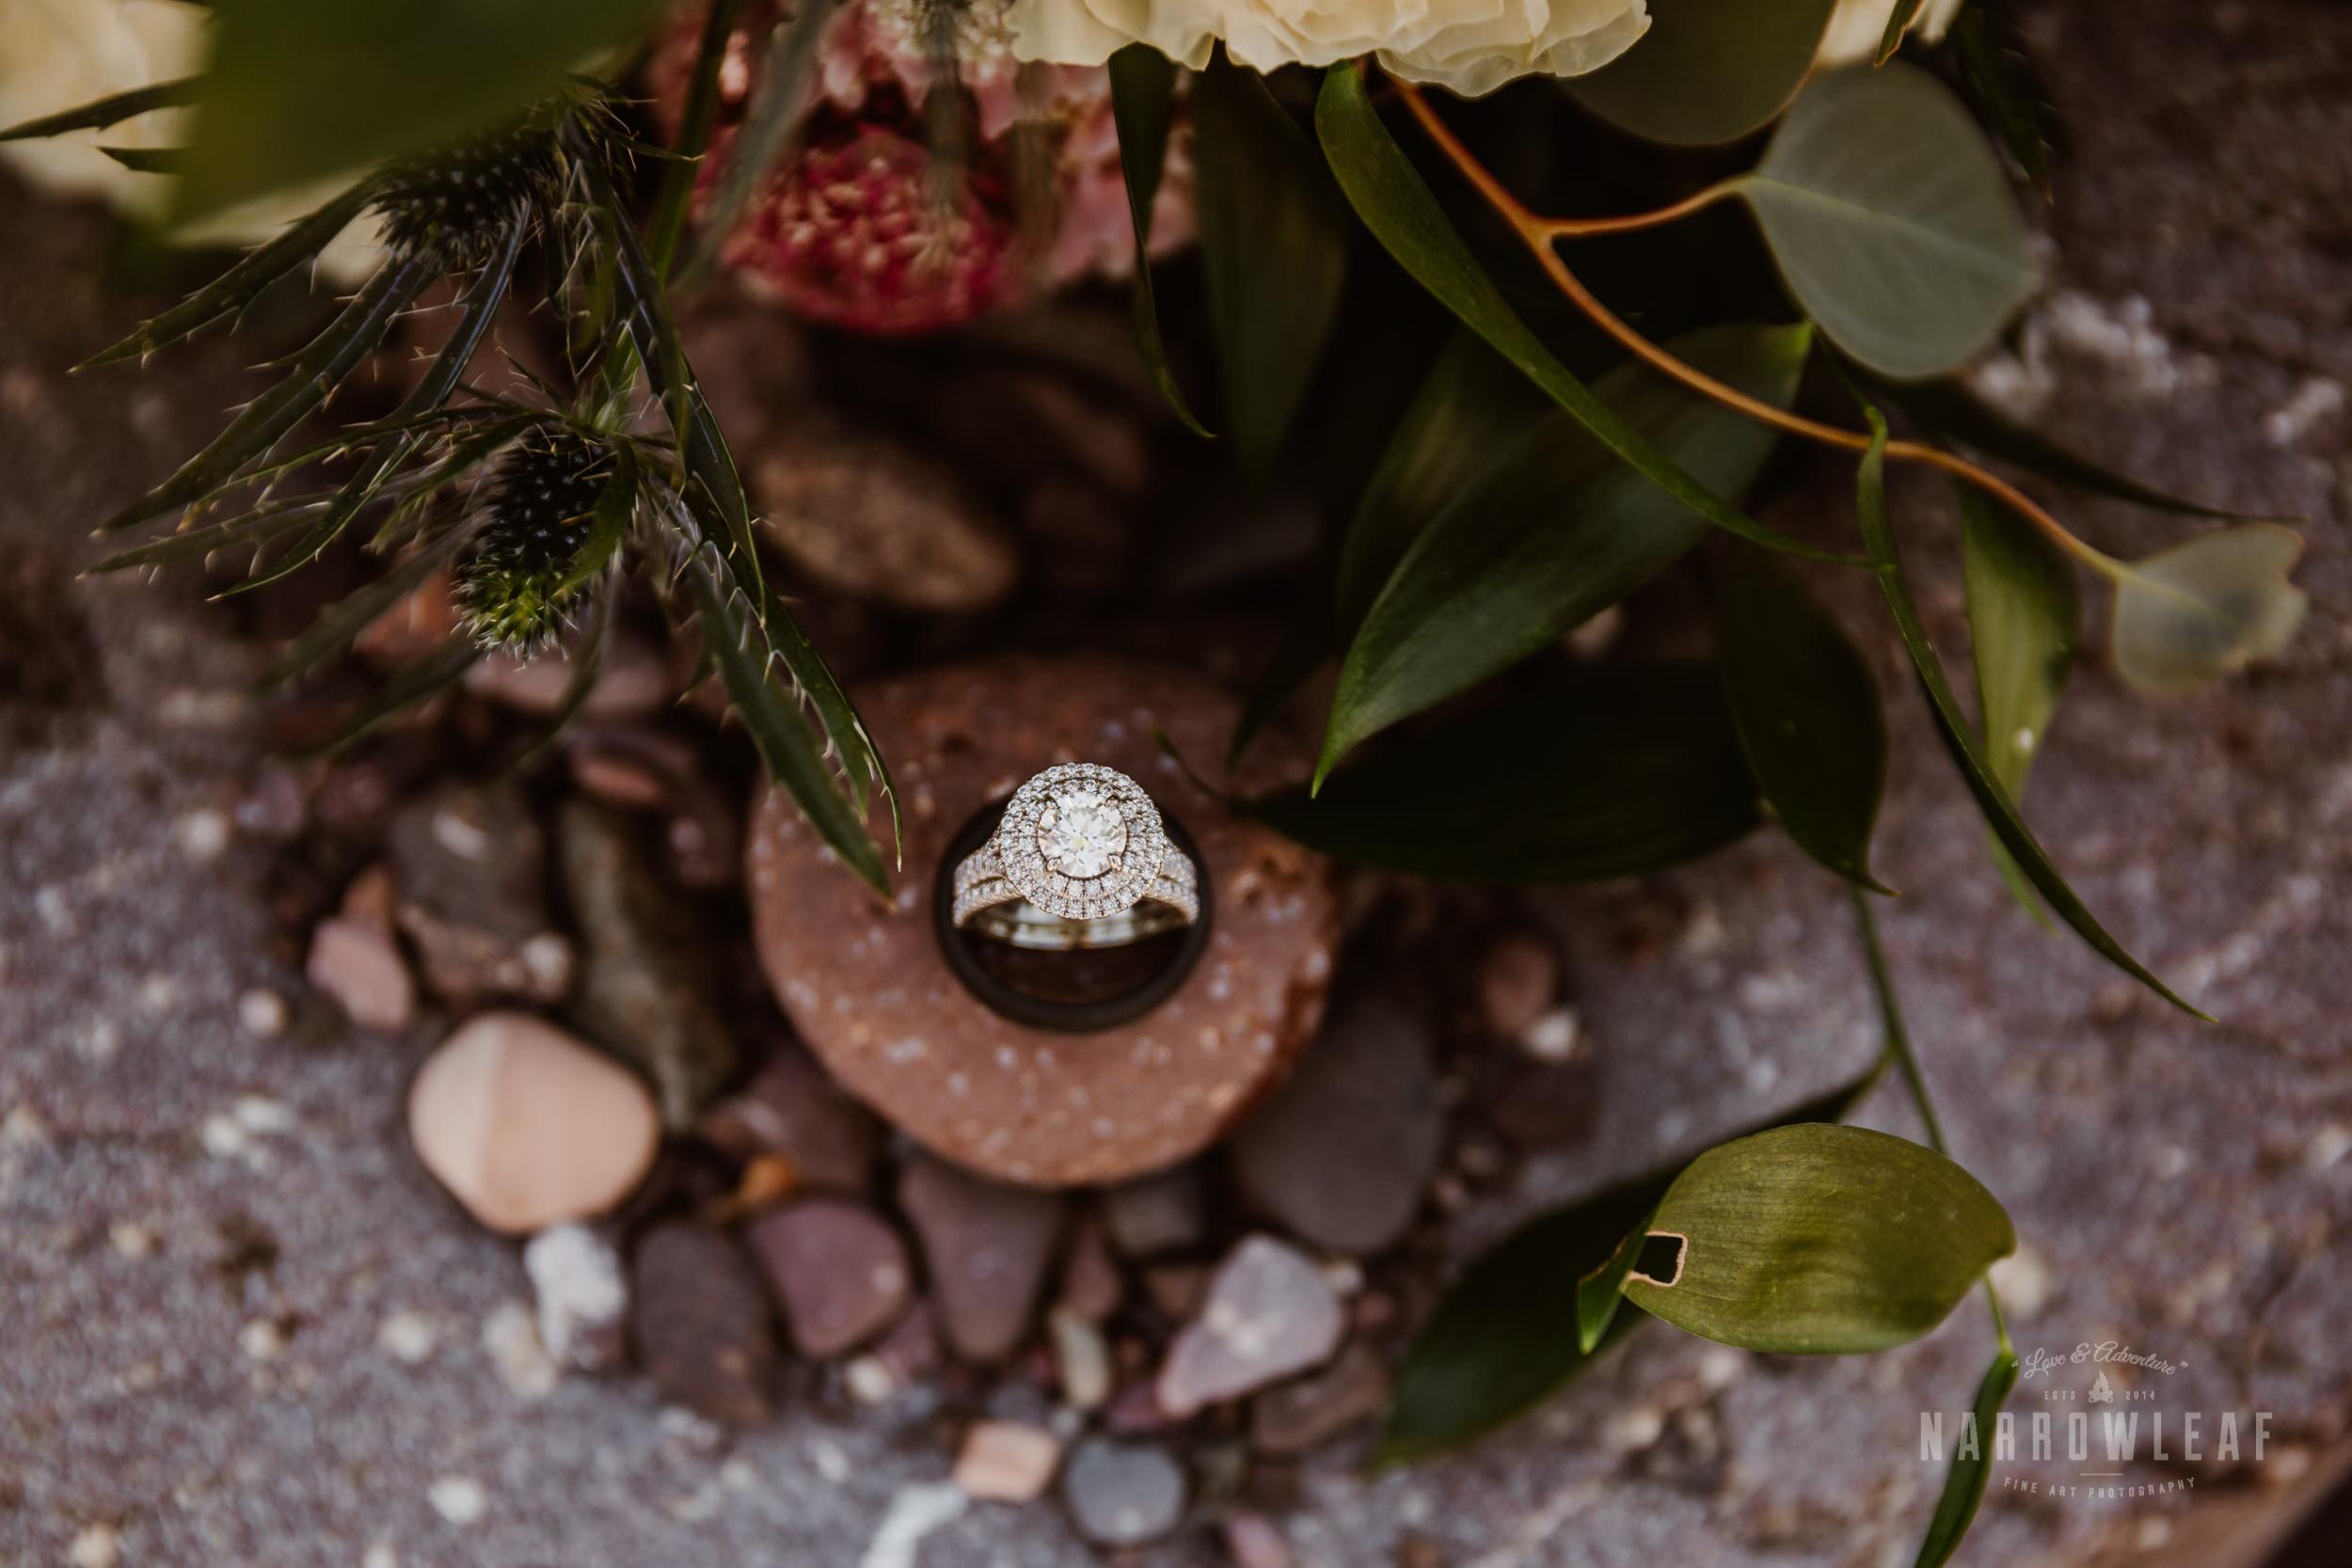 minnesota-adventure-elopement-Narrowleaf_Love_and_Adventure_Photography-9315.jpg